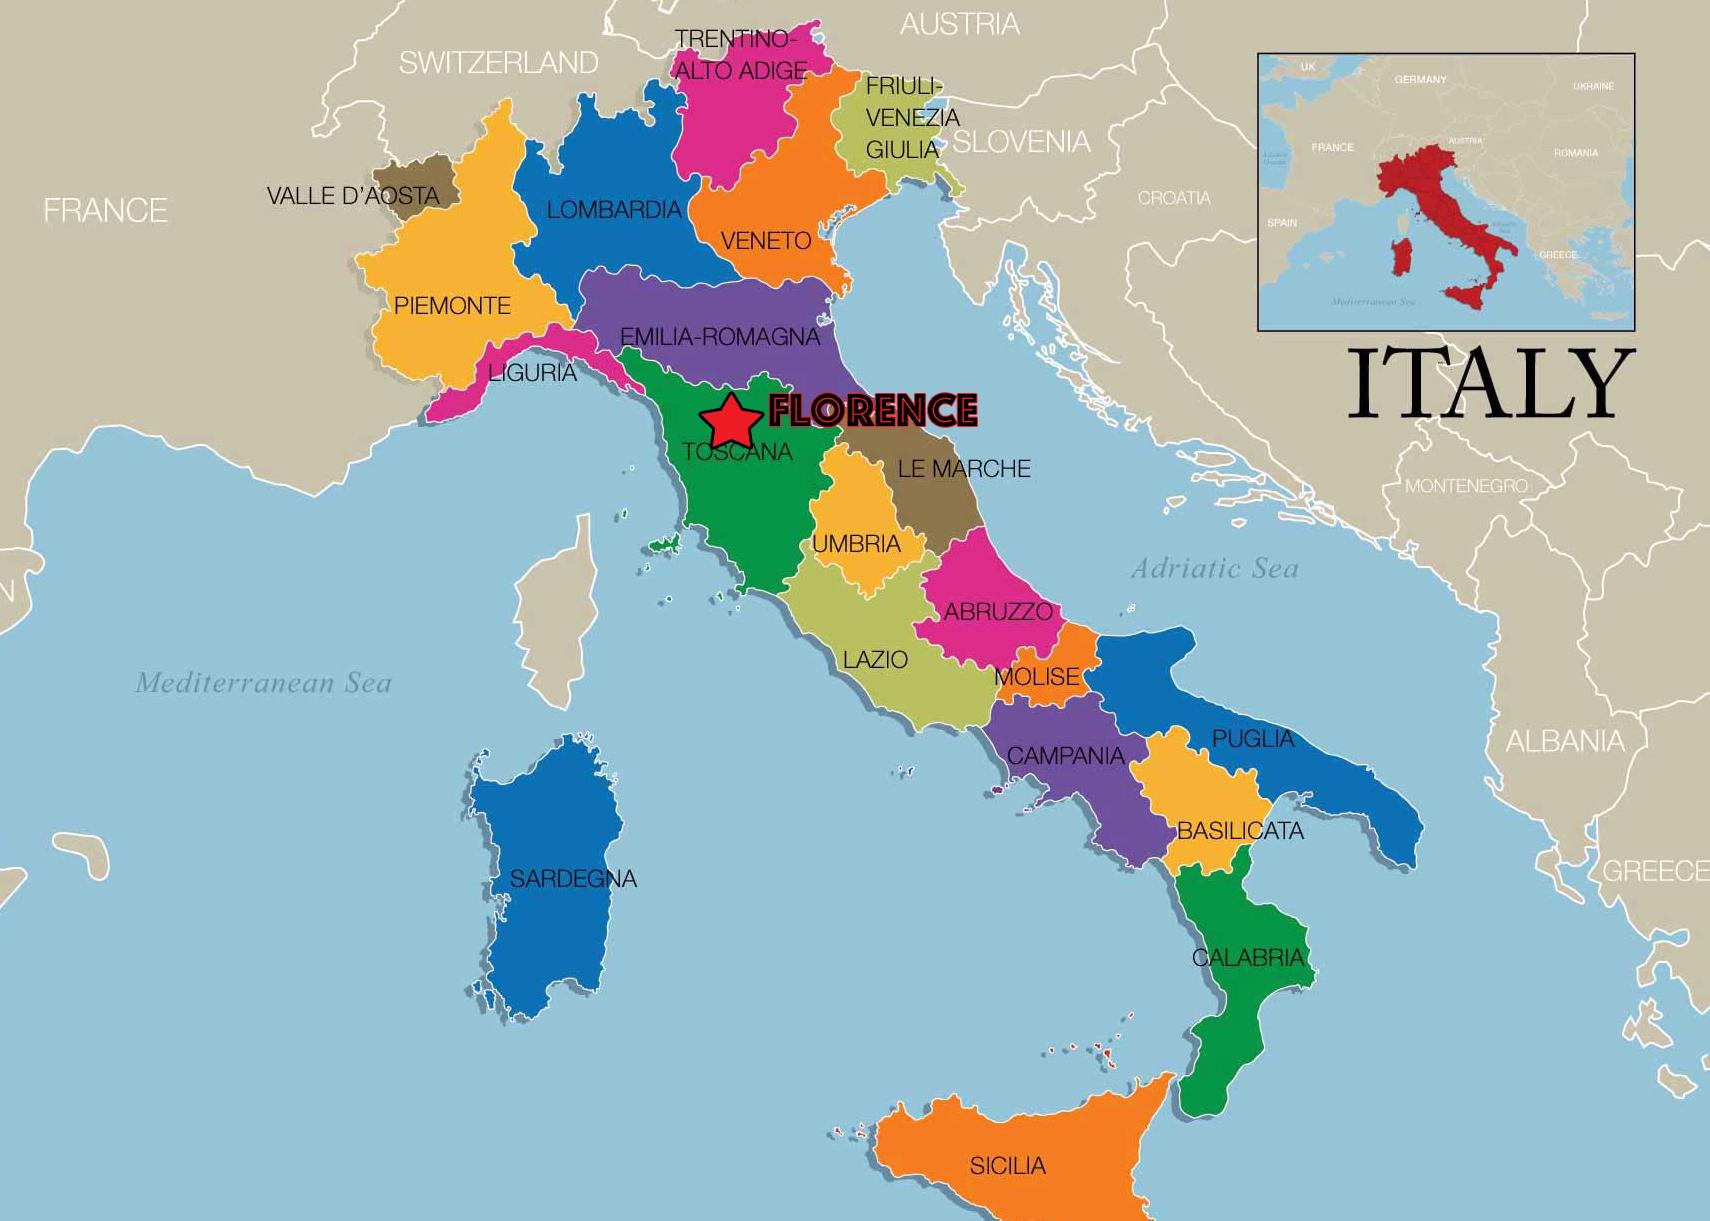 Corkbuzz-Map-of-Italy2 copy.jpg